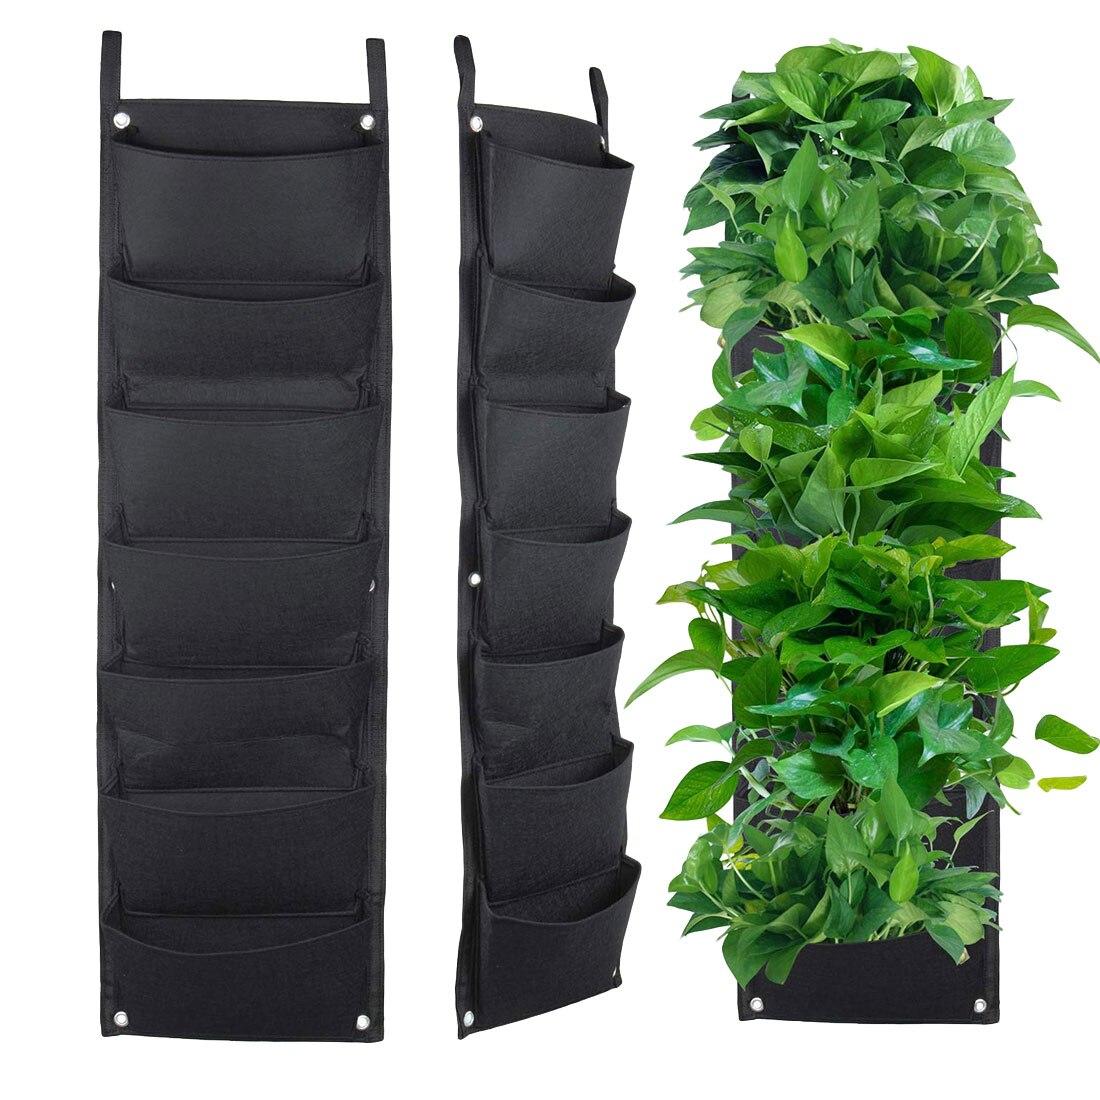 3/7 Pockets Black Felt Fabric Grow Bag Pots Vegetable Plant Wall Hanging Garden Vertical Gardening